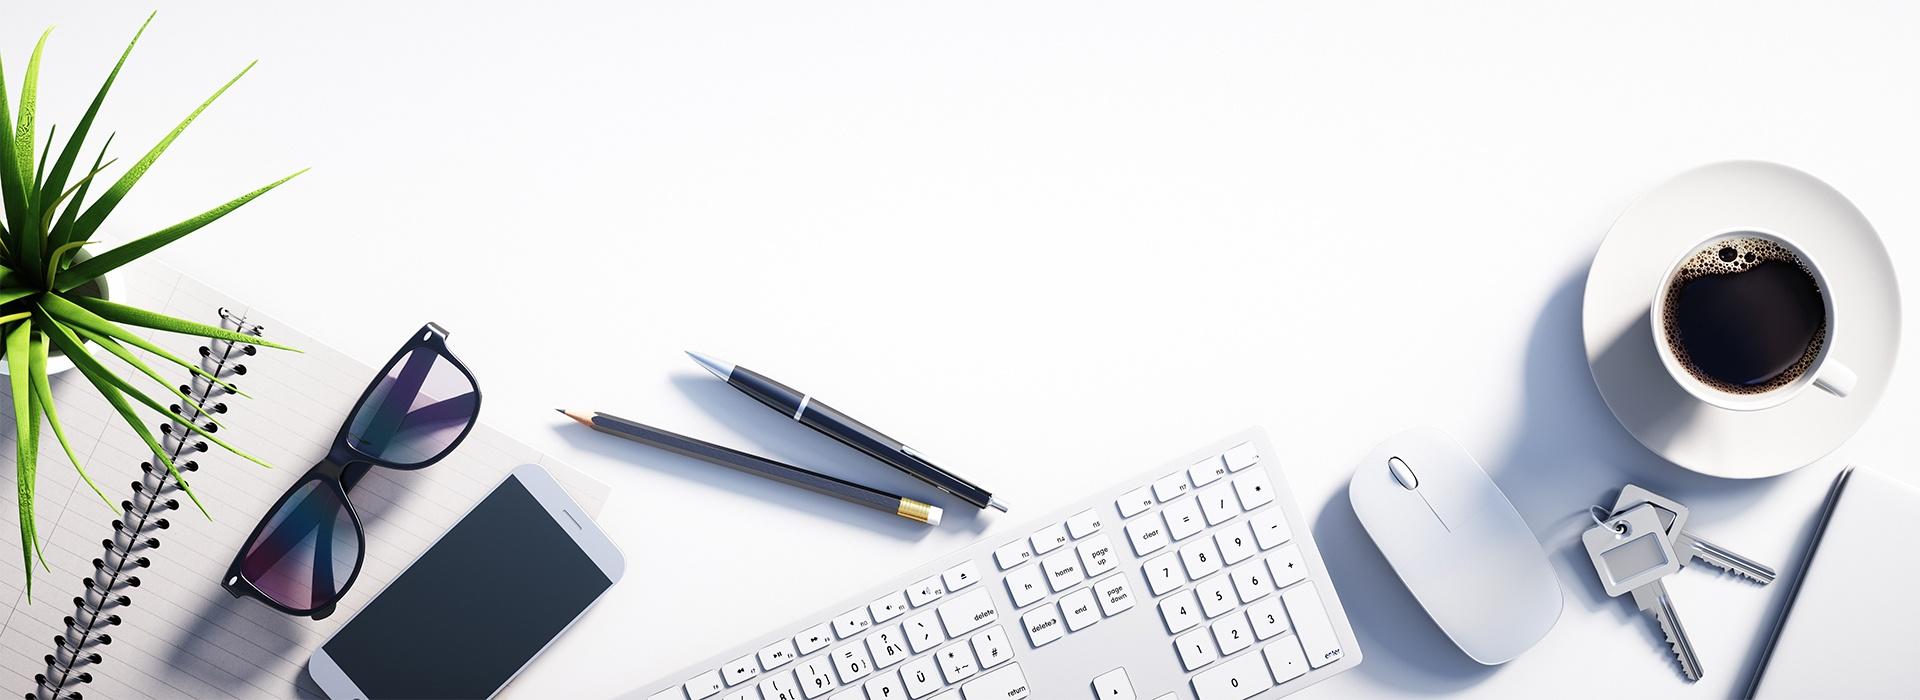 Professional Organizing, Downsizing & Life Management - Consider It Done - Harrisburg PA